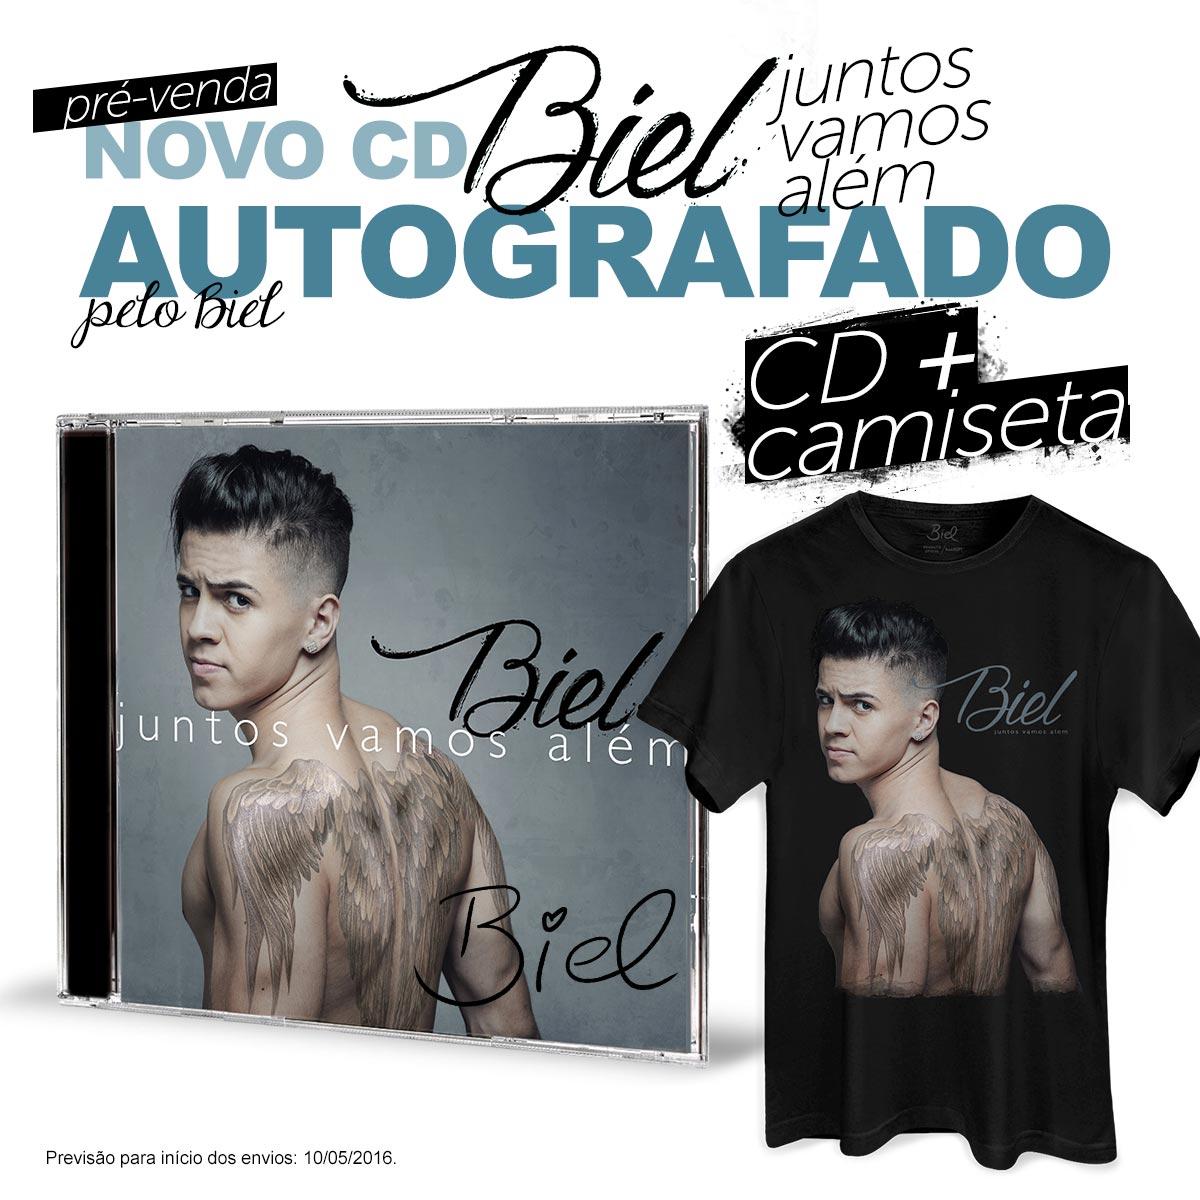 Combo Biel Camiseta Masculina + CD Juntos Vamos Além AUTOGRAFADO